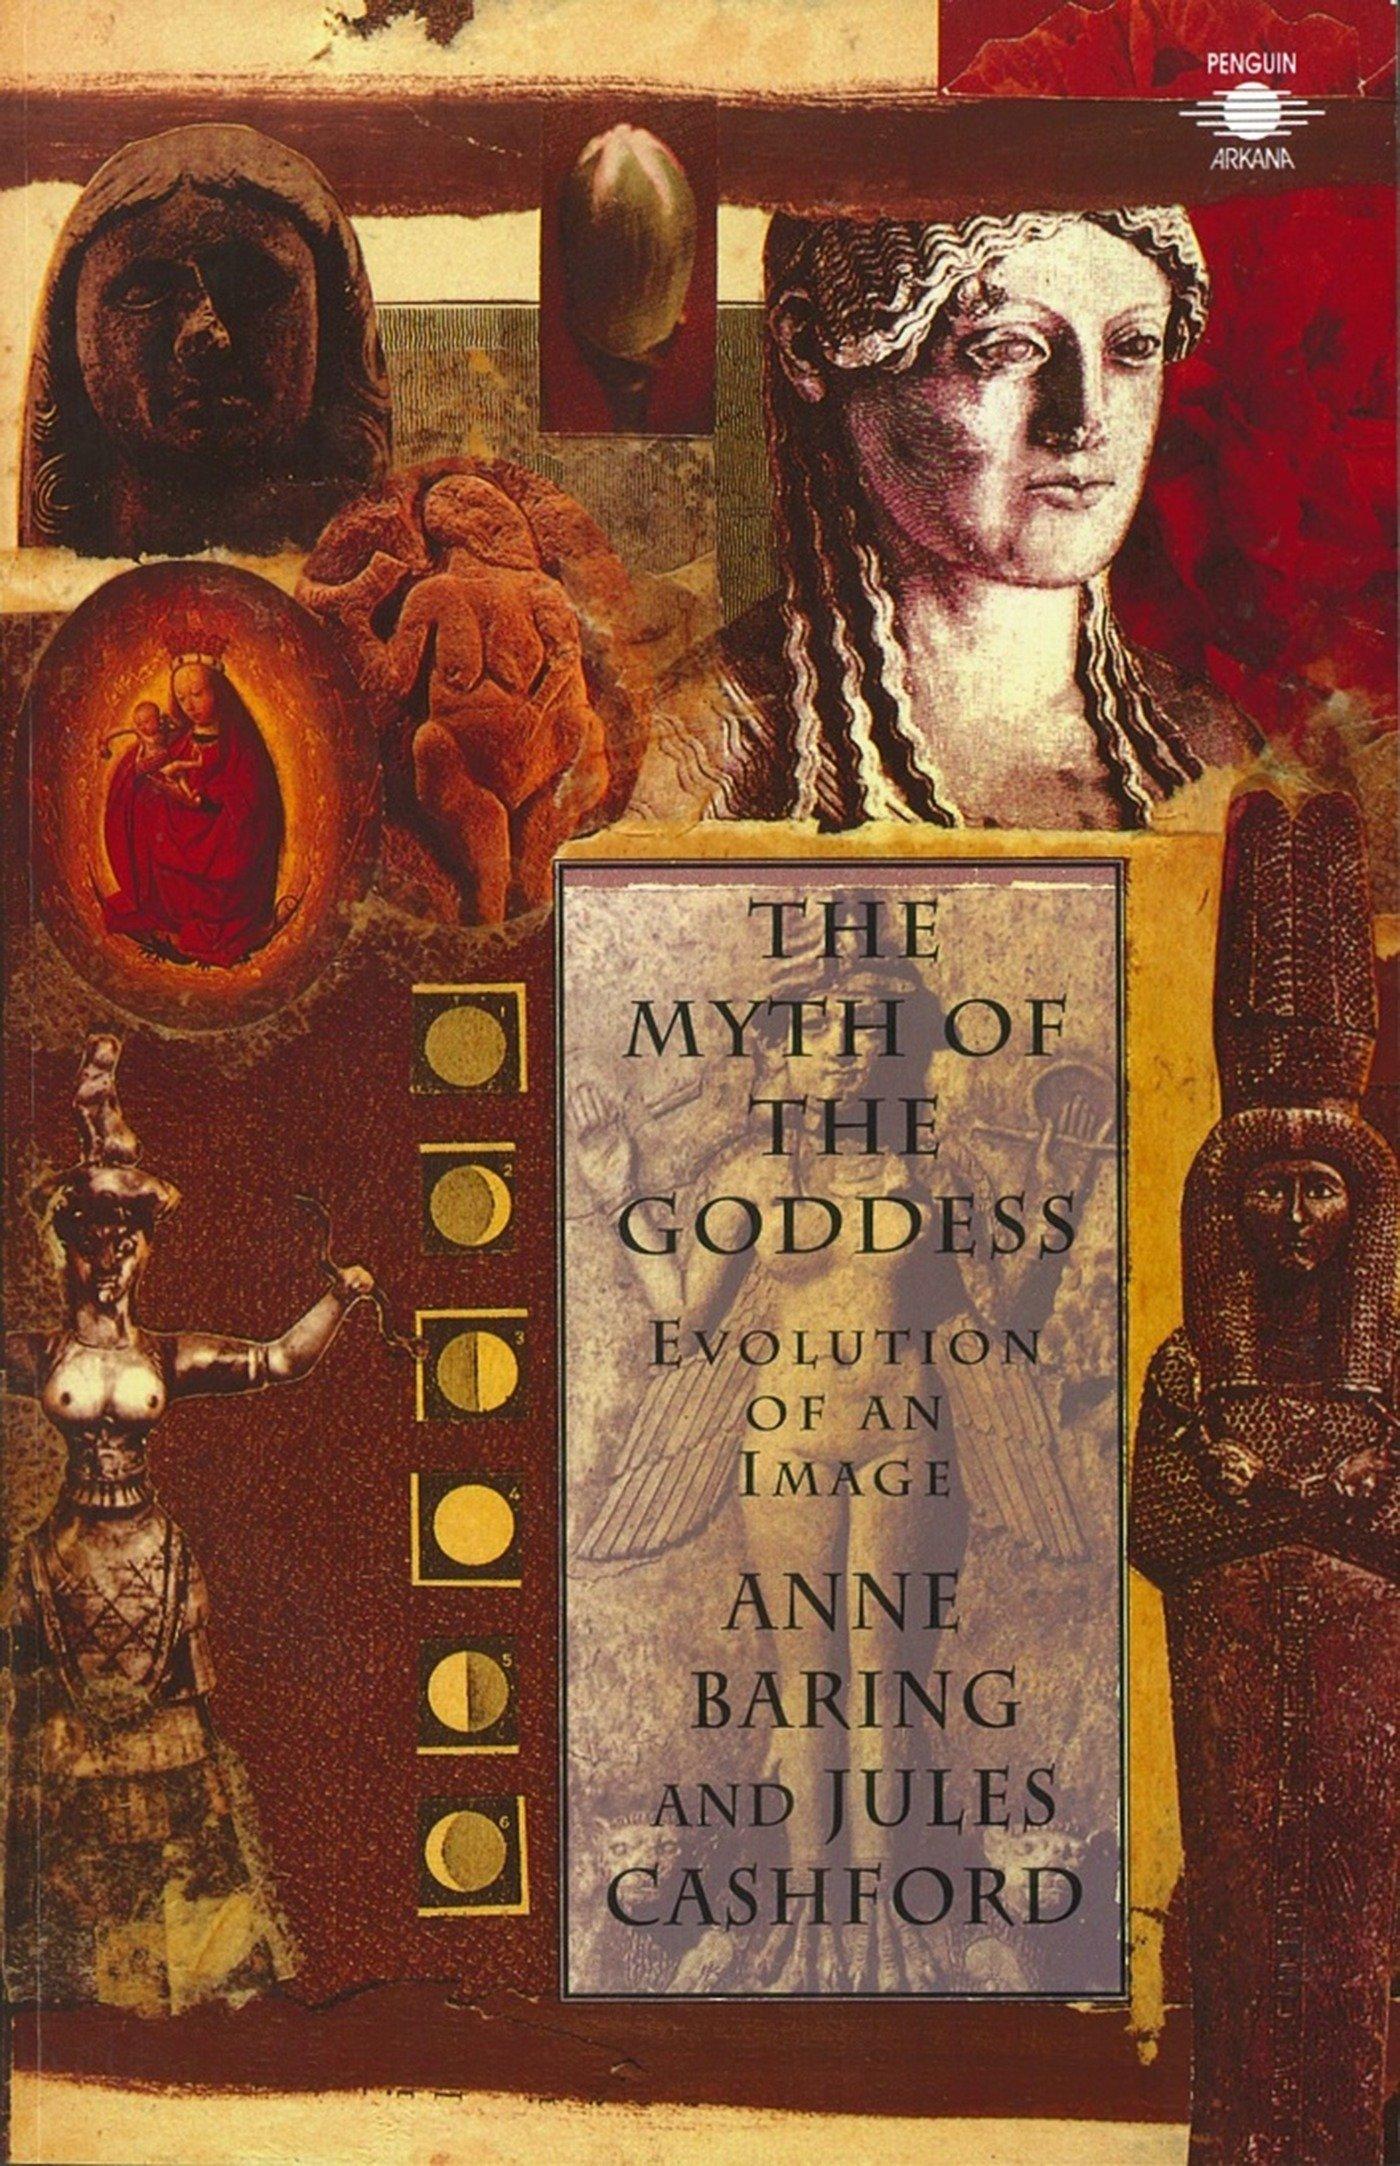 The Myth of the Goddess: Evolution of an Image (Compass)